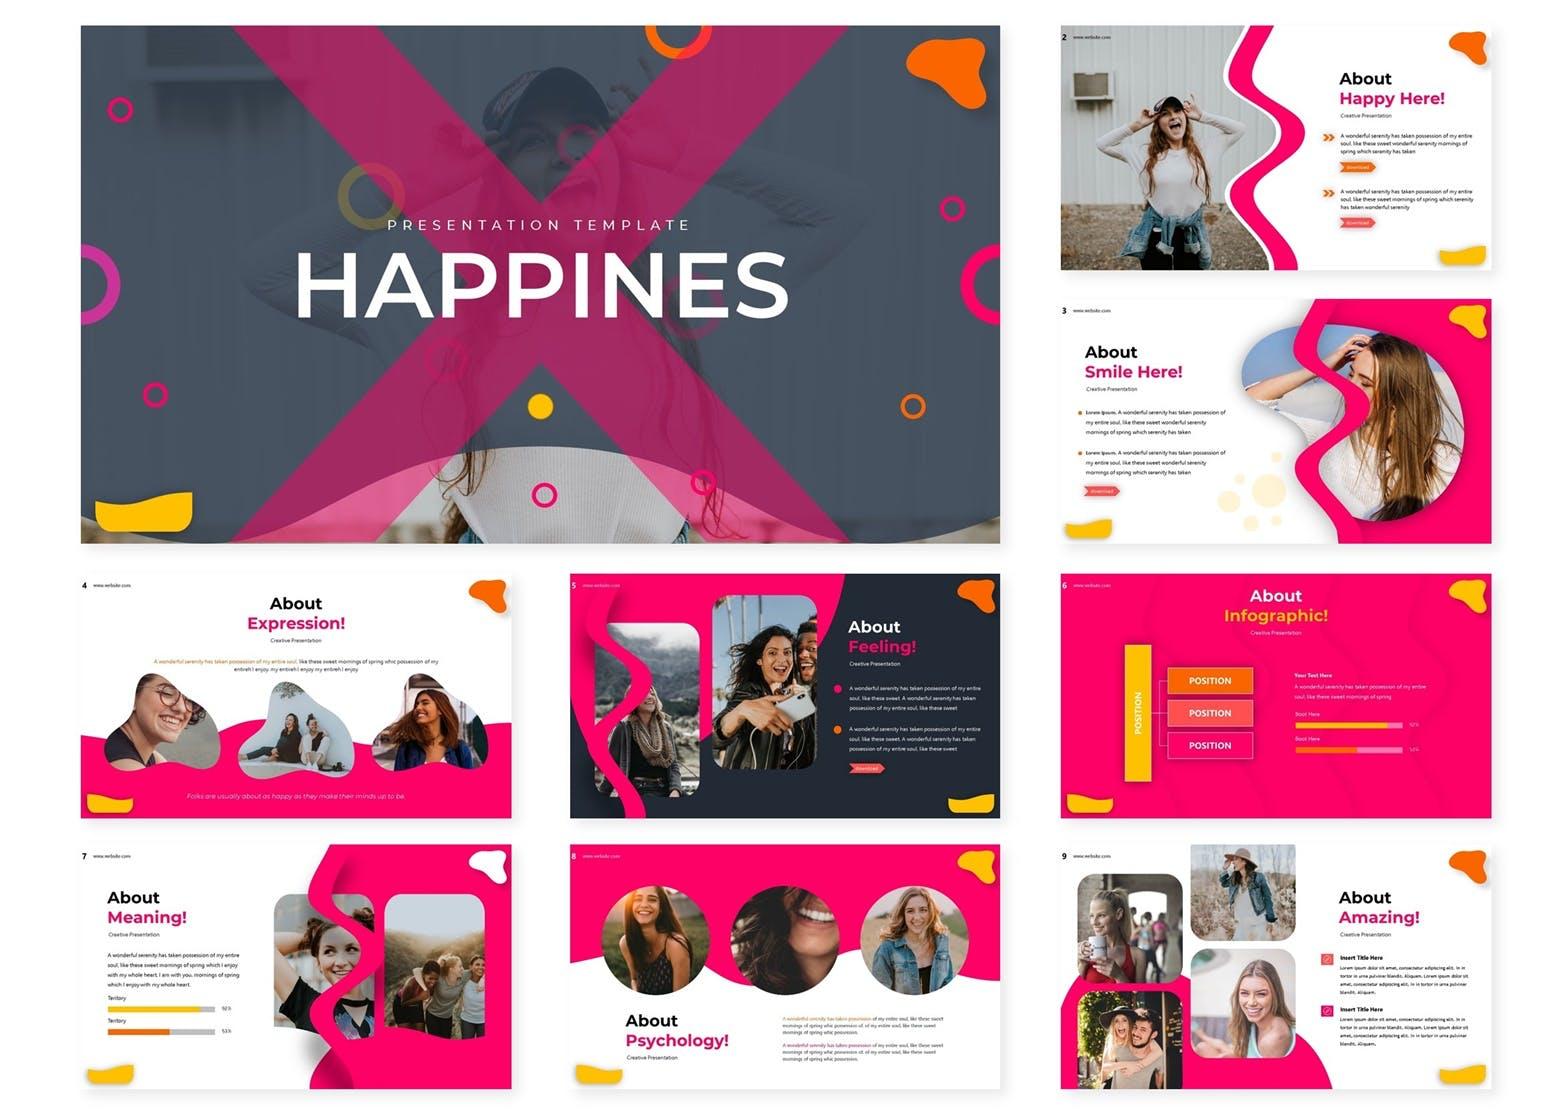 Keynote幻灯片生活快乐主题设计模板 Happines | Keynote Template设计素材模板